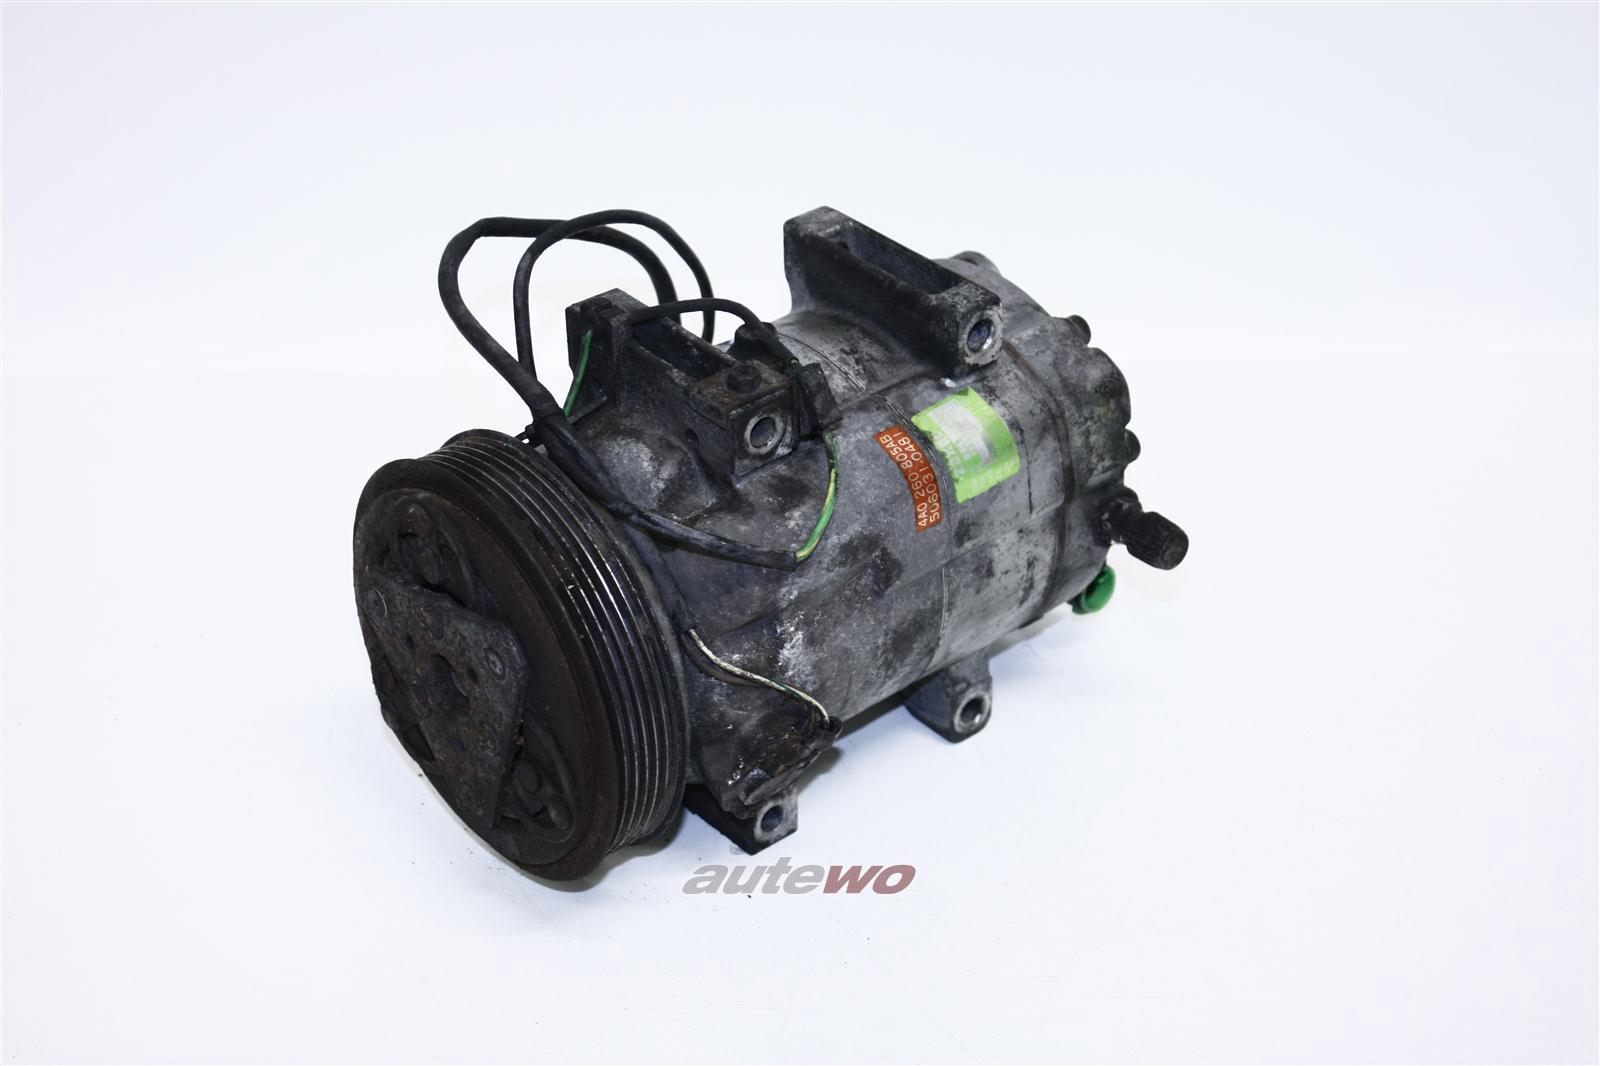 Audi 80 B4/100 C4 6 Zylinder Klima-Kompressor R134A Zexel 4A0260805AH 4A0260805AB